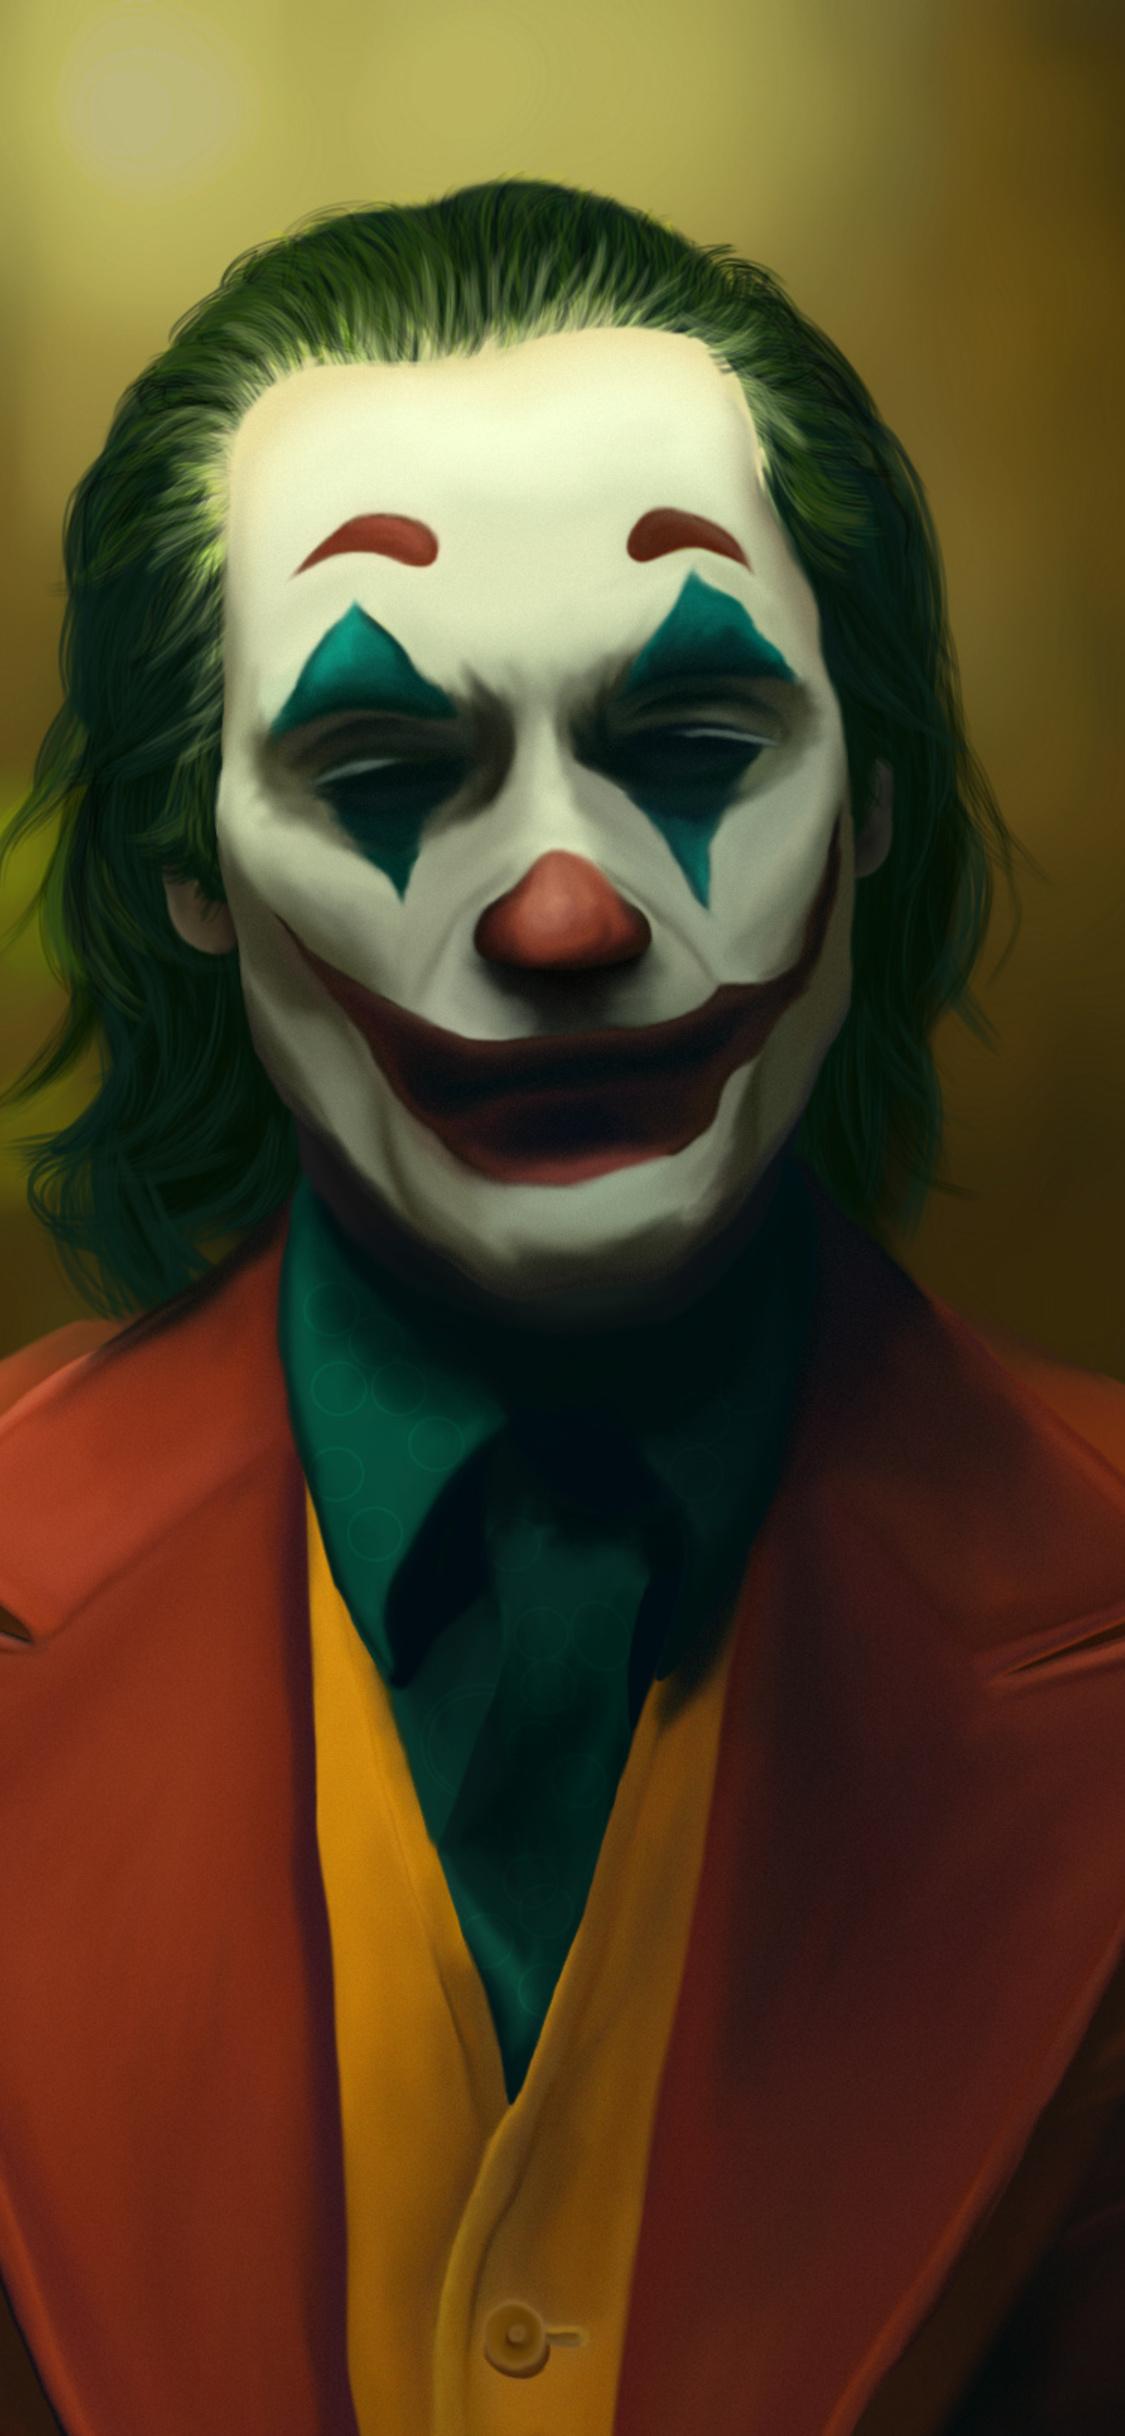 1125x2436 The Joker Joaquin Phoenix Art New Iphone Xs Iphone